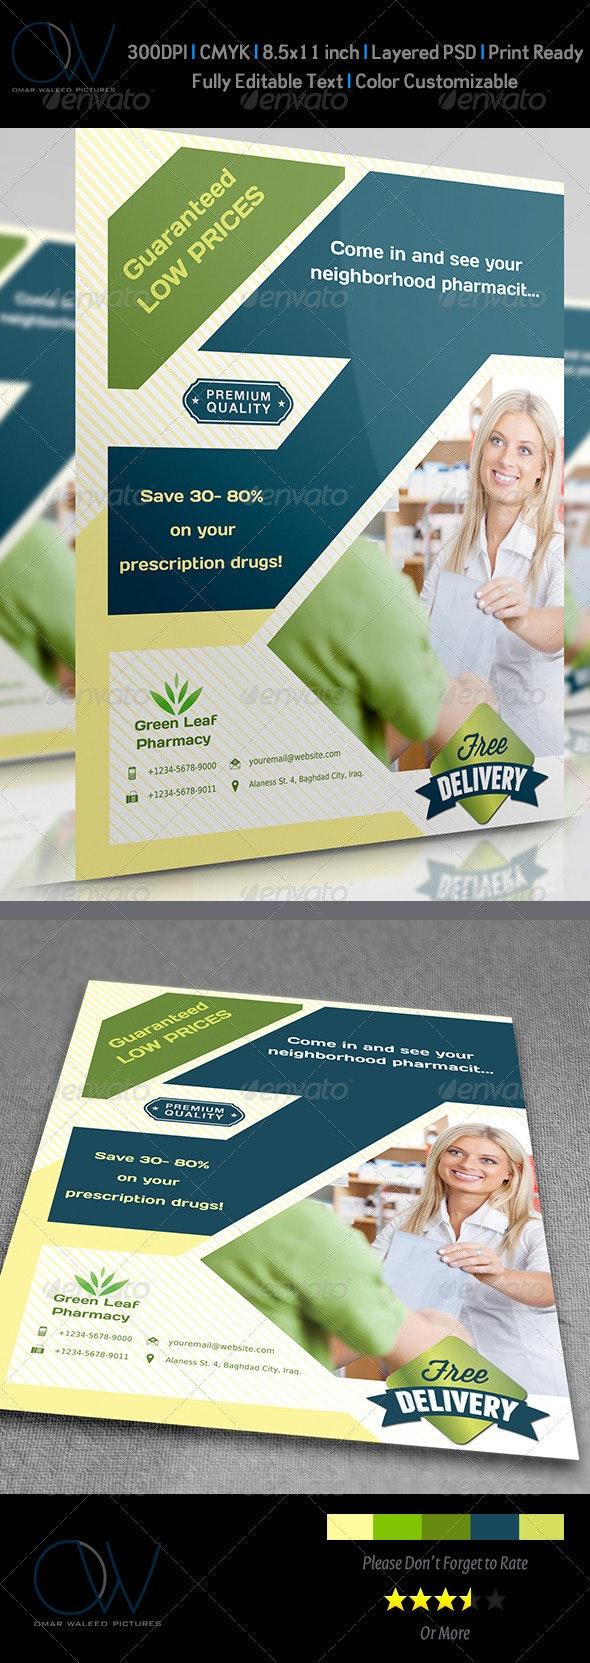 Pharmacy Flyer - Corporate Flyers